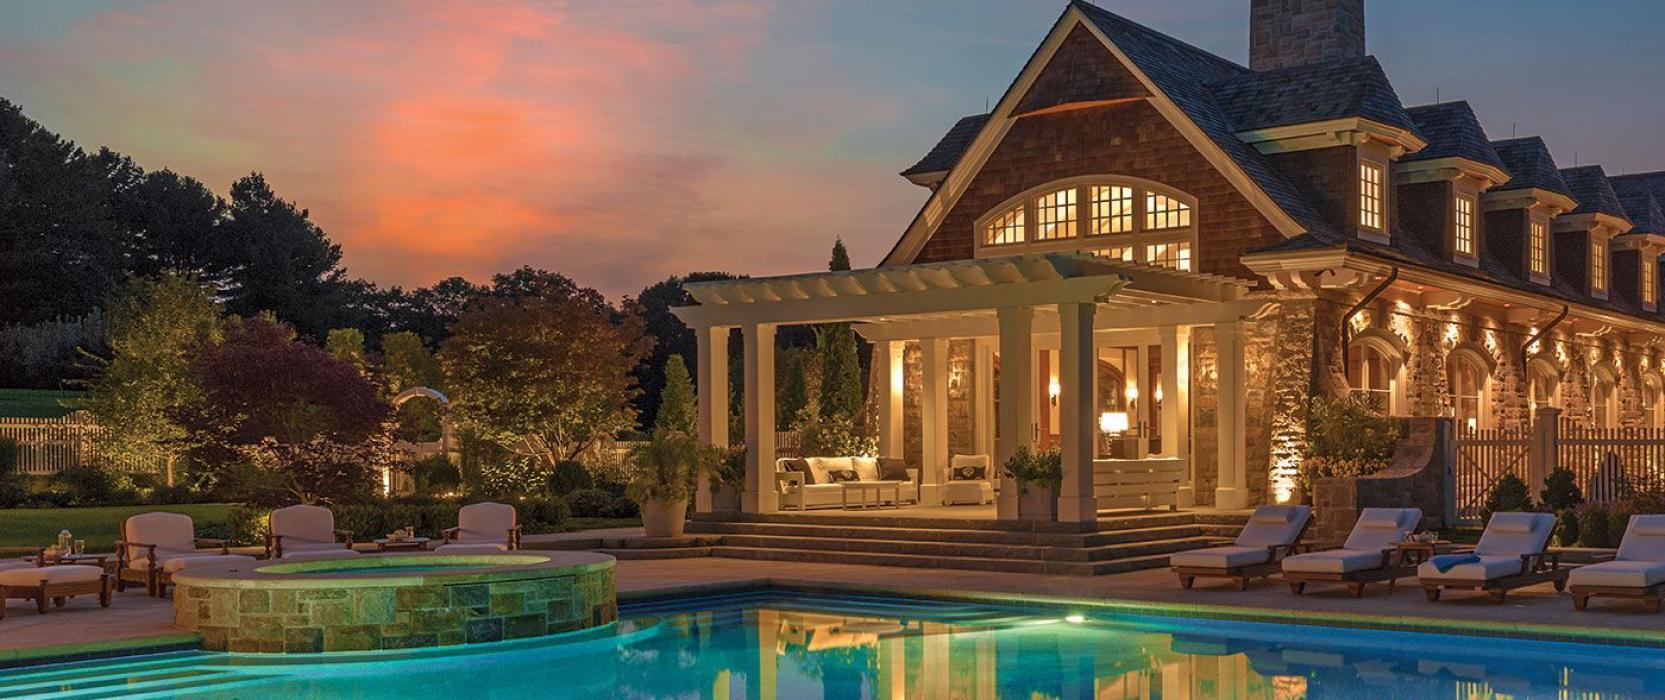 Illuminated pool terrace by Sudbury Design Group